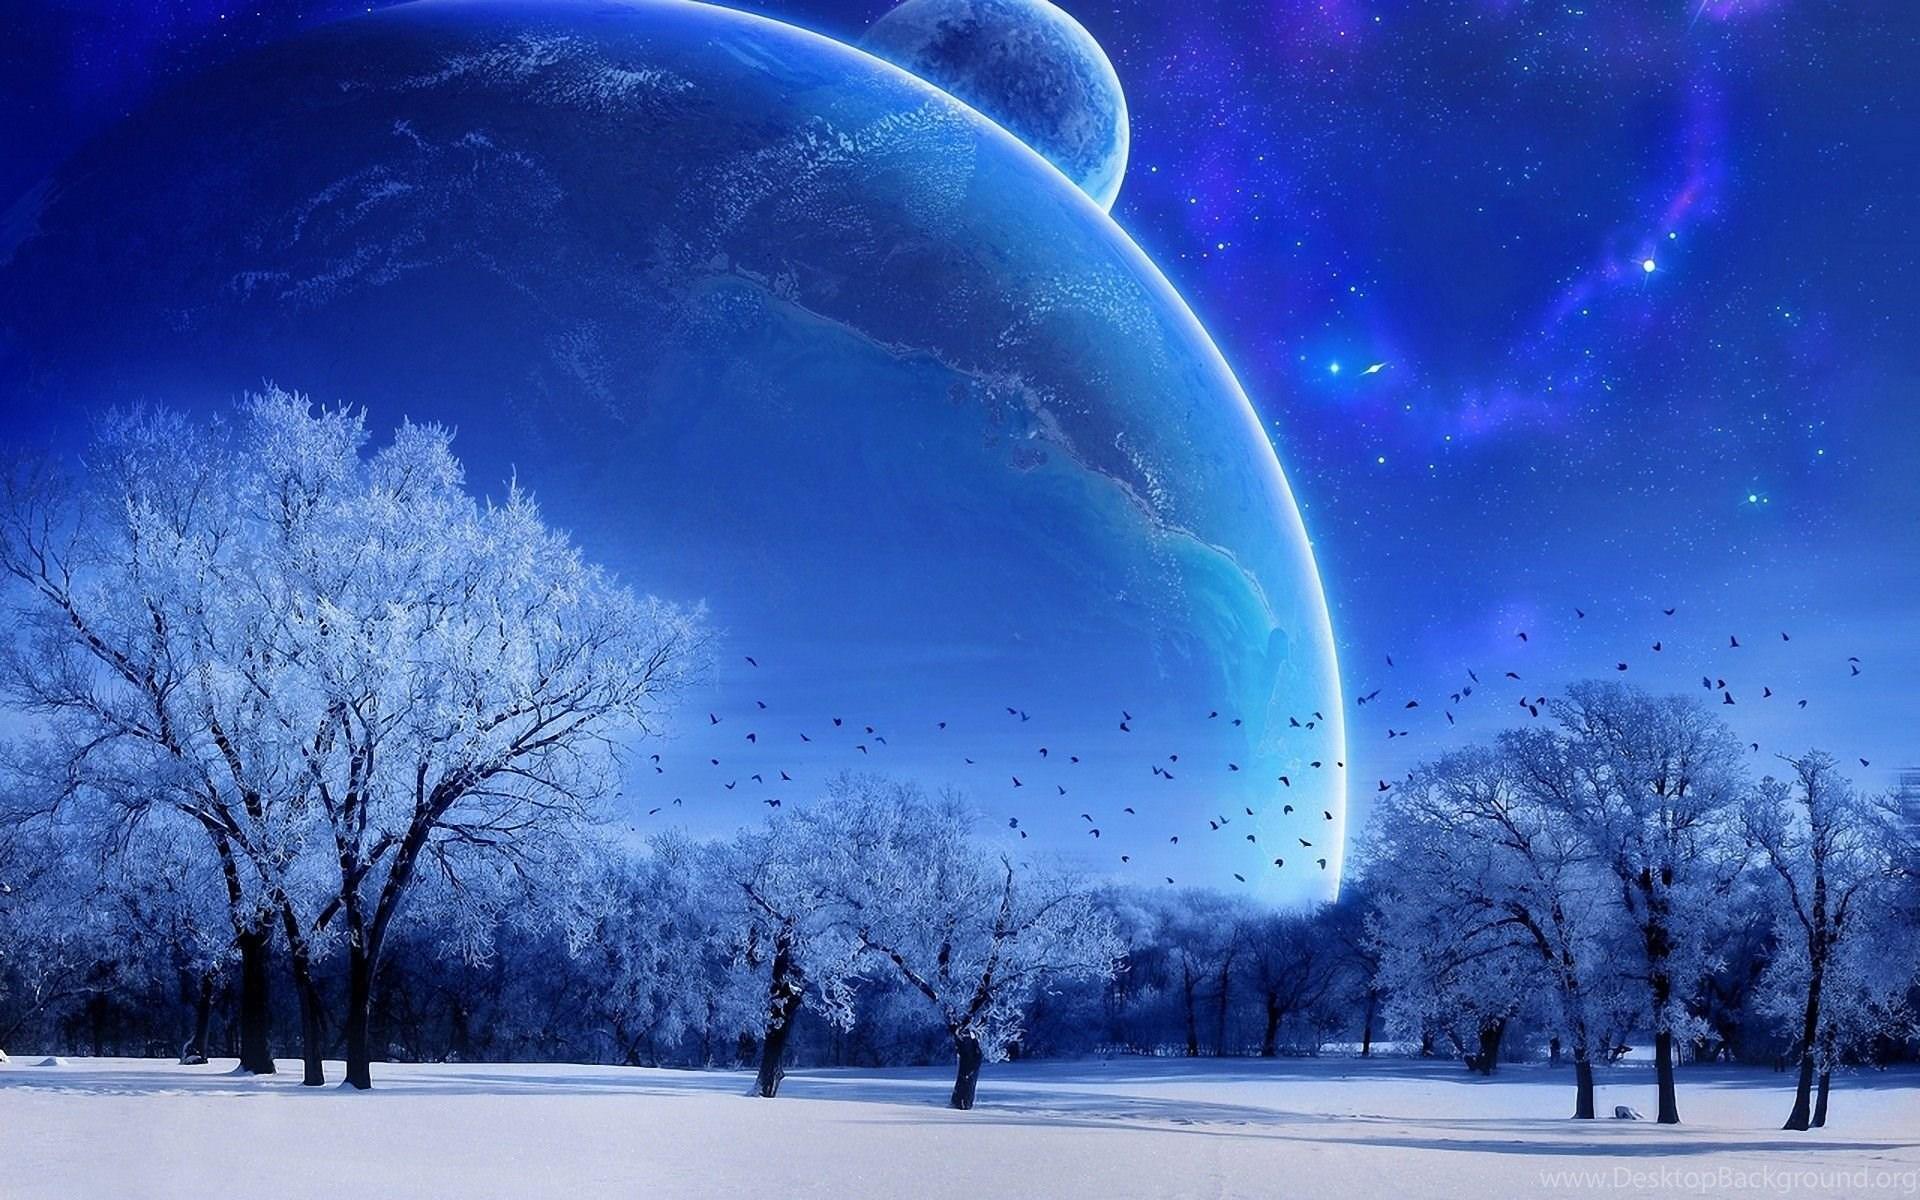 winter wonderland desktop wallpaper, winter wonderland backgrounds